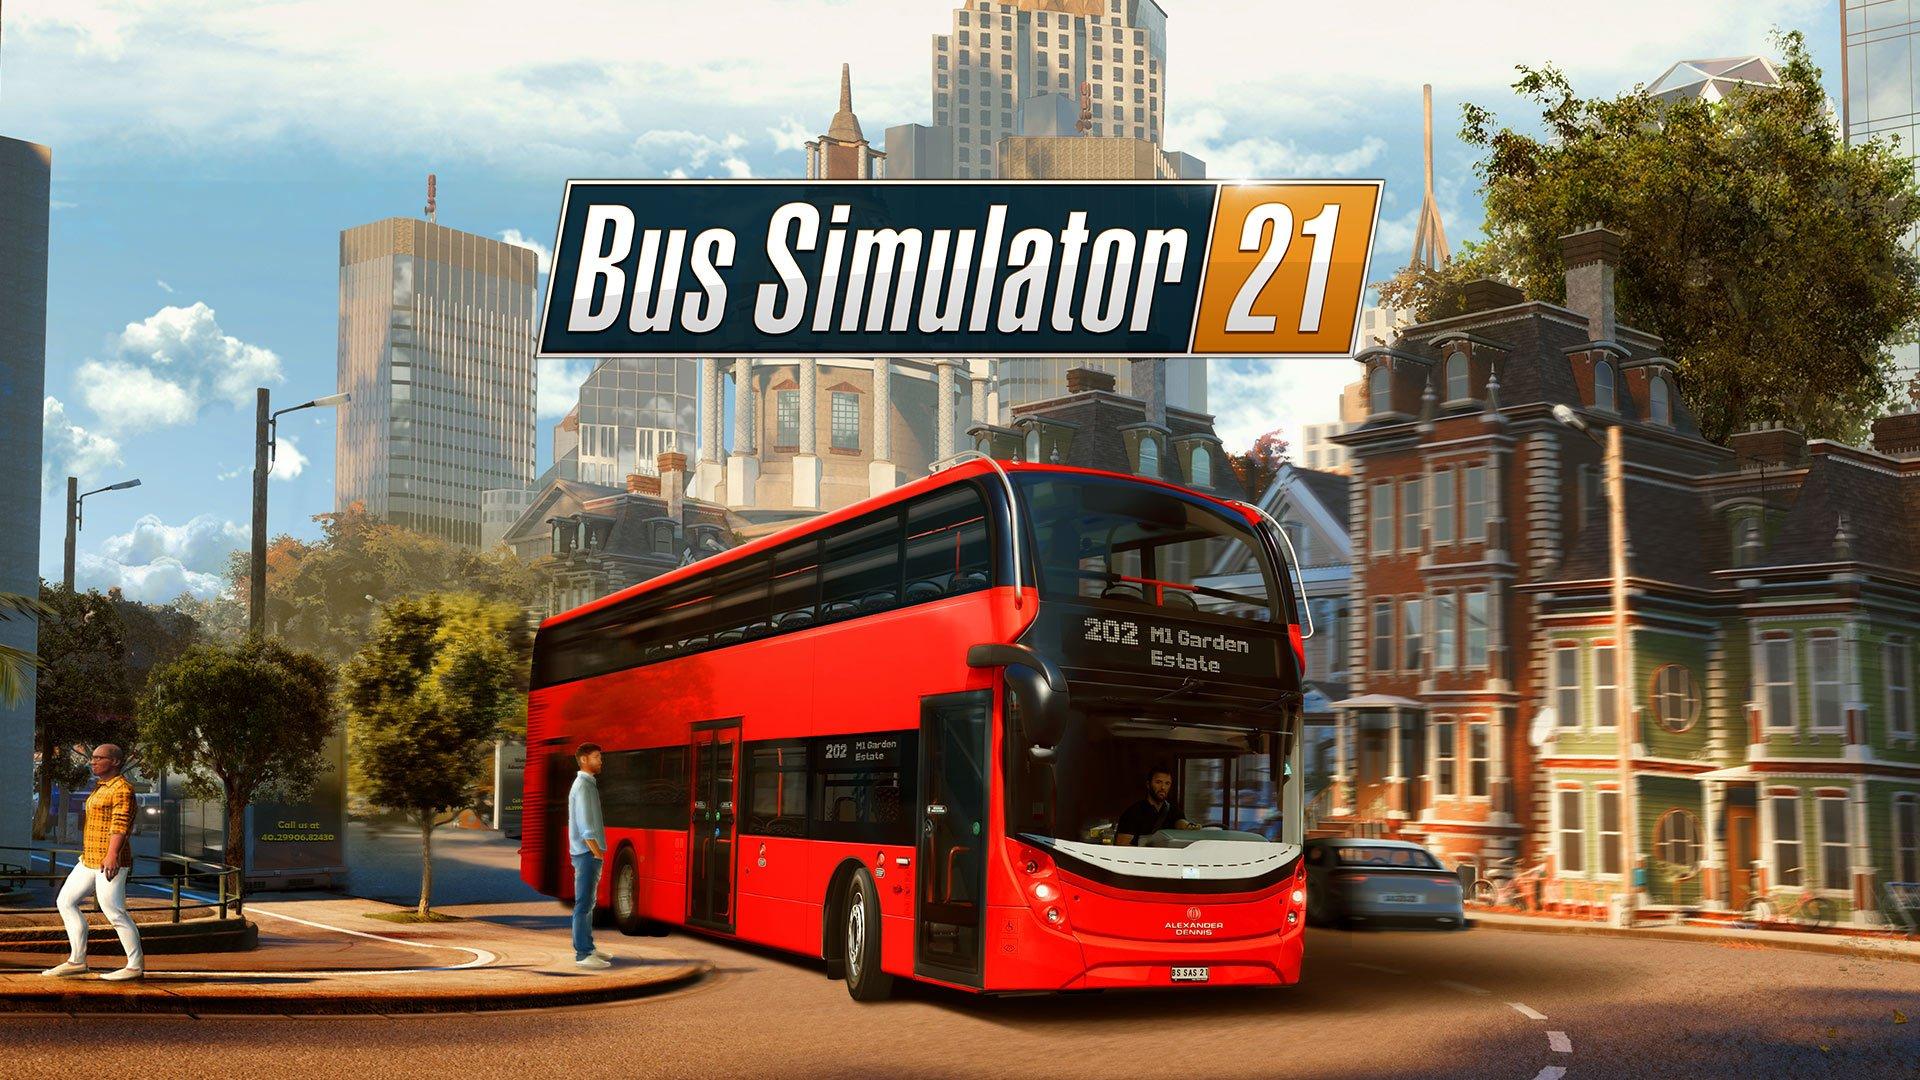 Bus Simulator Bus Simulator